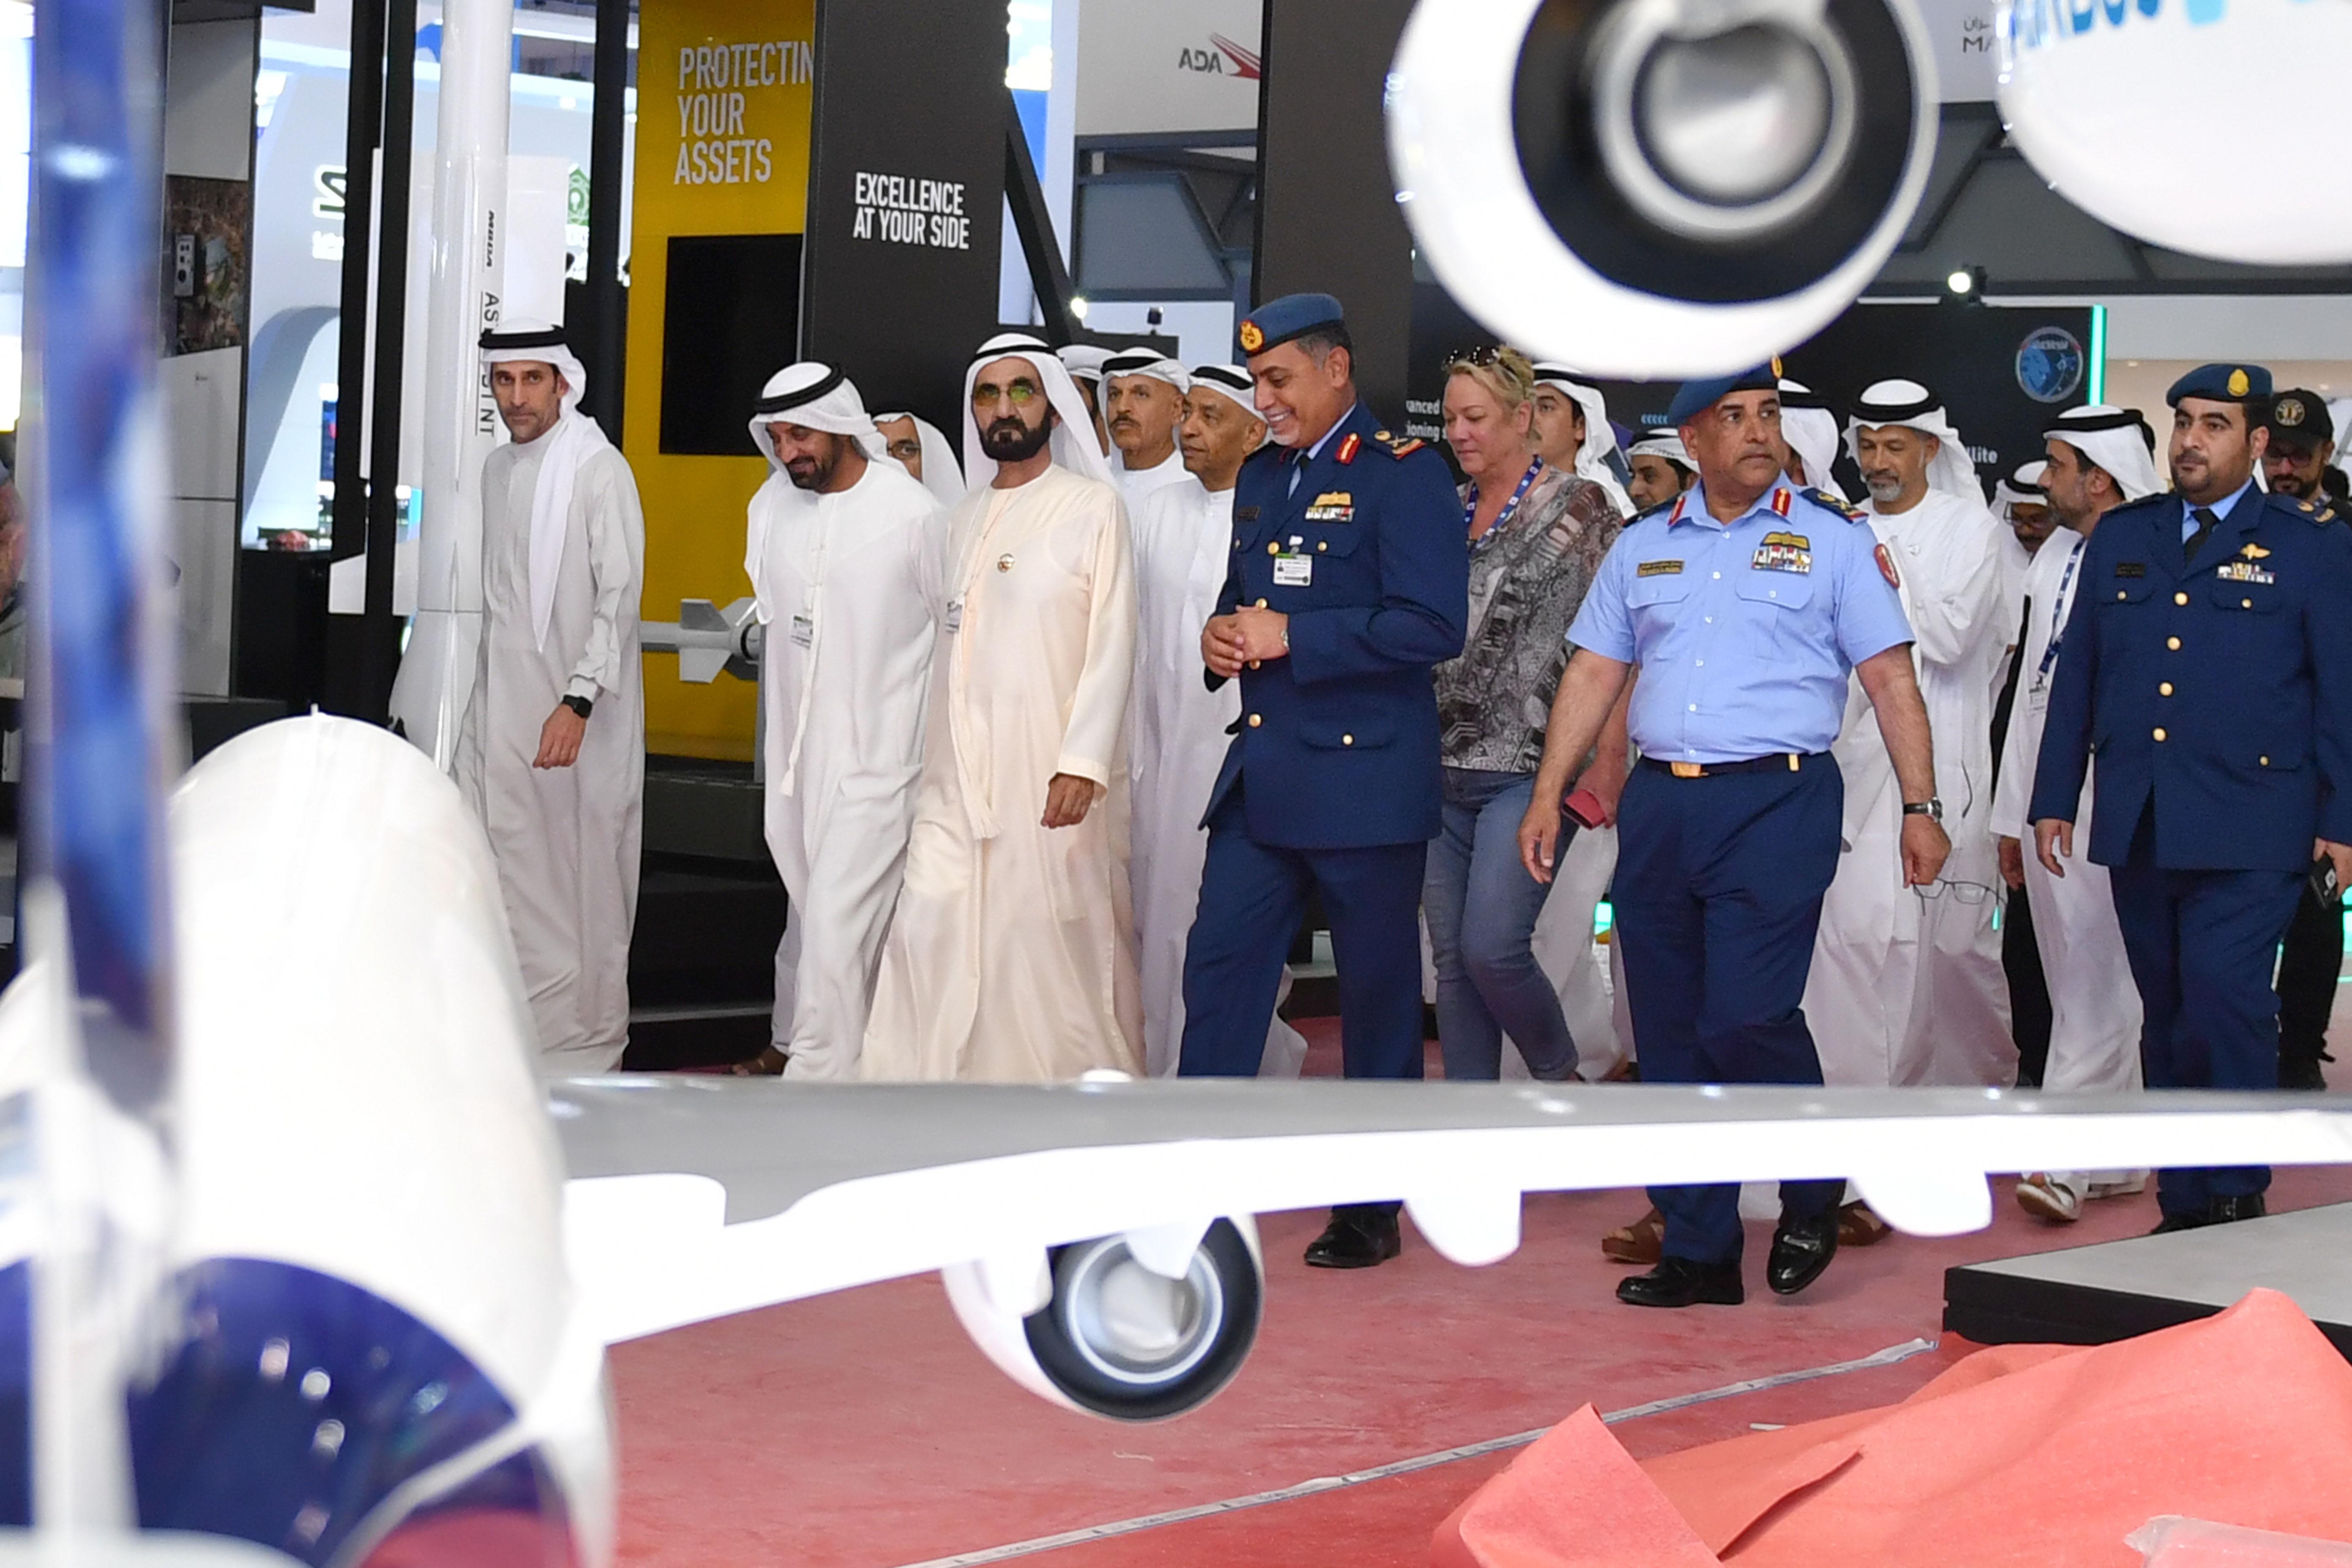 His Highness Sheikh Mohammed bin Rashid Al Maktoum - Mohammed bin Rashid inspects preparations for Dubai Airshow 2019